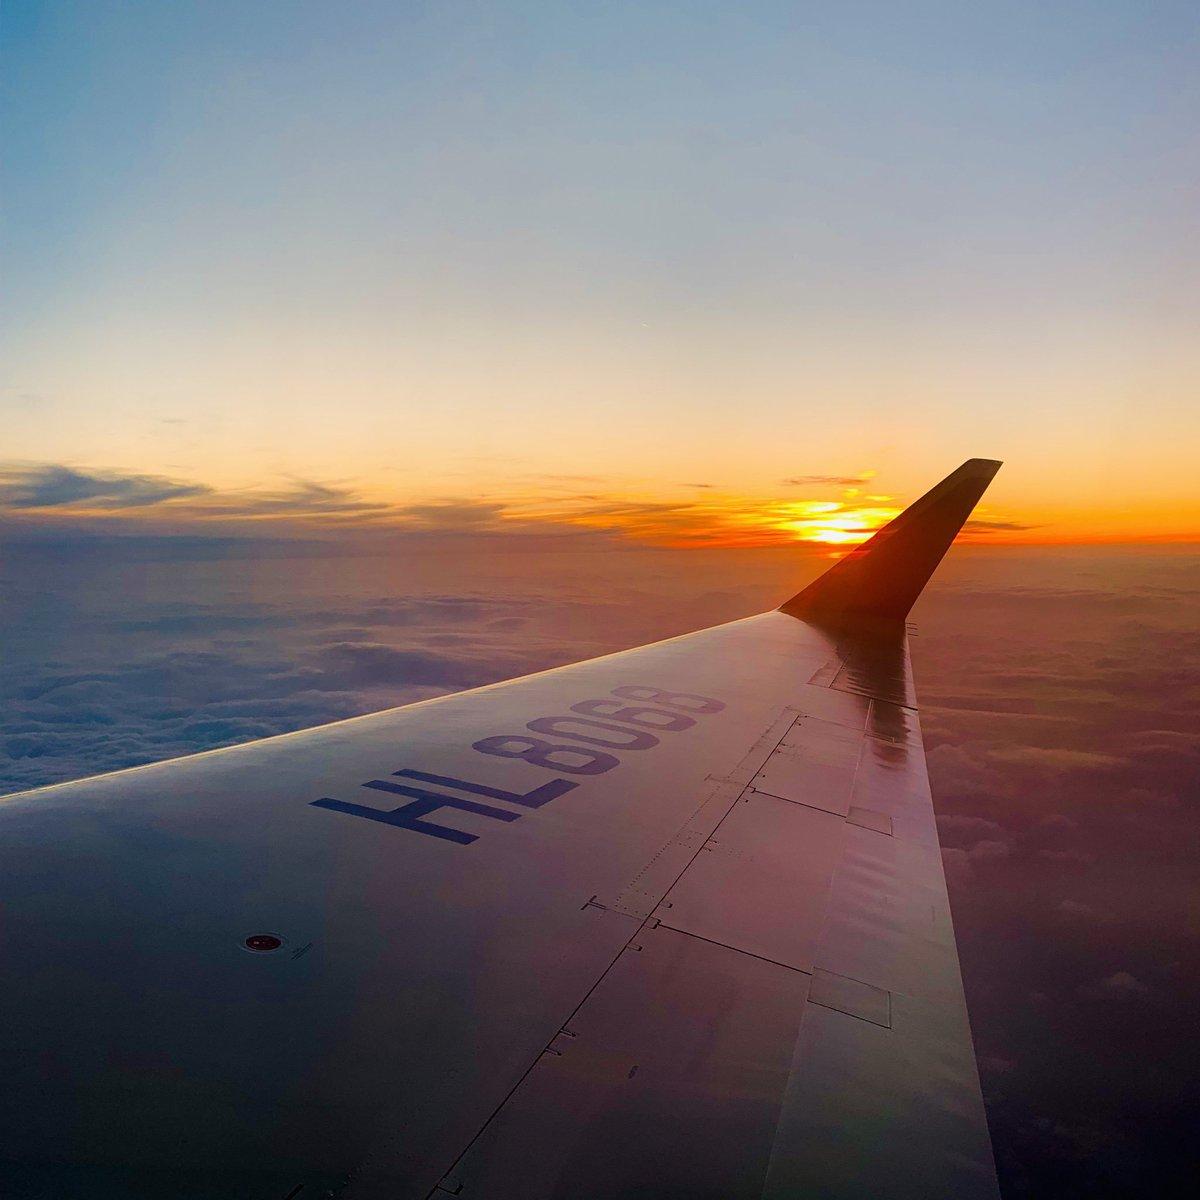 RT @BTS_twt: 요거는 비행기에서 찍은 거 https://t.co/IzfsyXjlNl